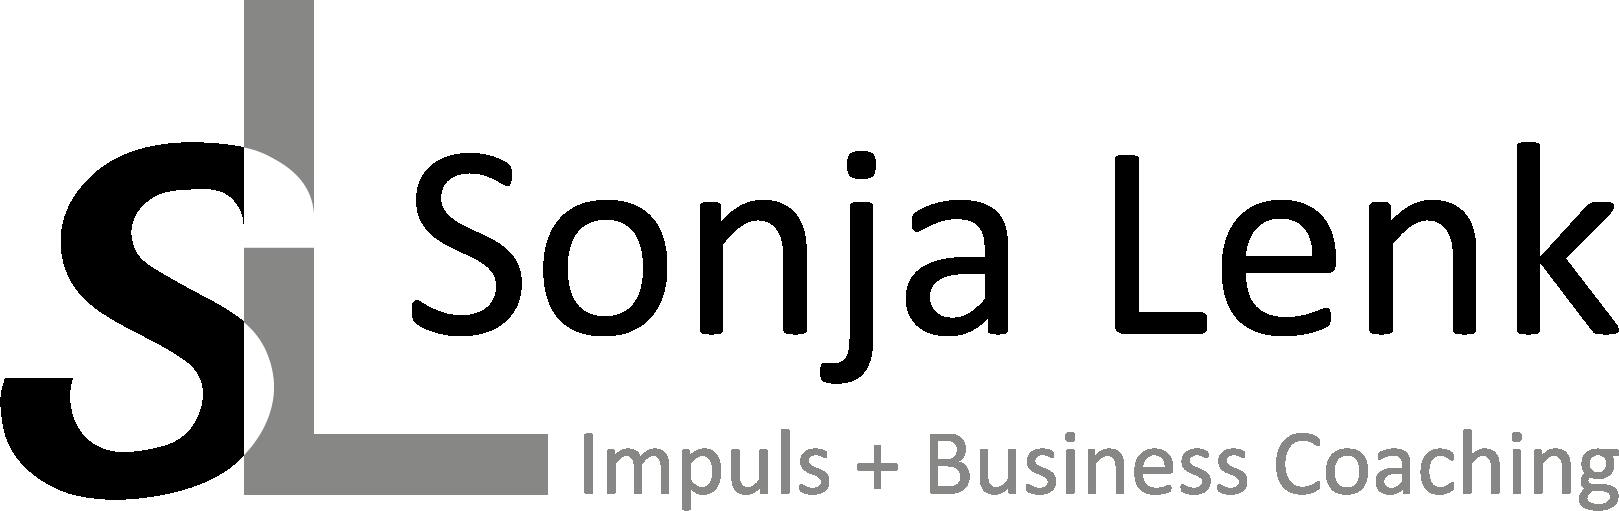 Impuls + Business Coaching